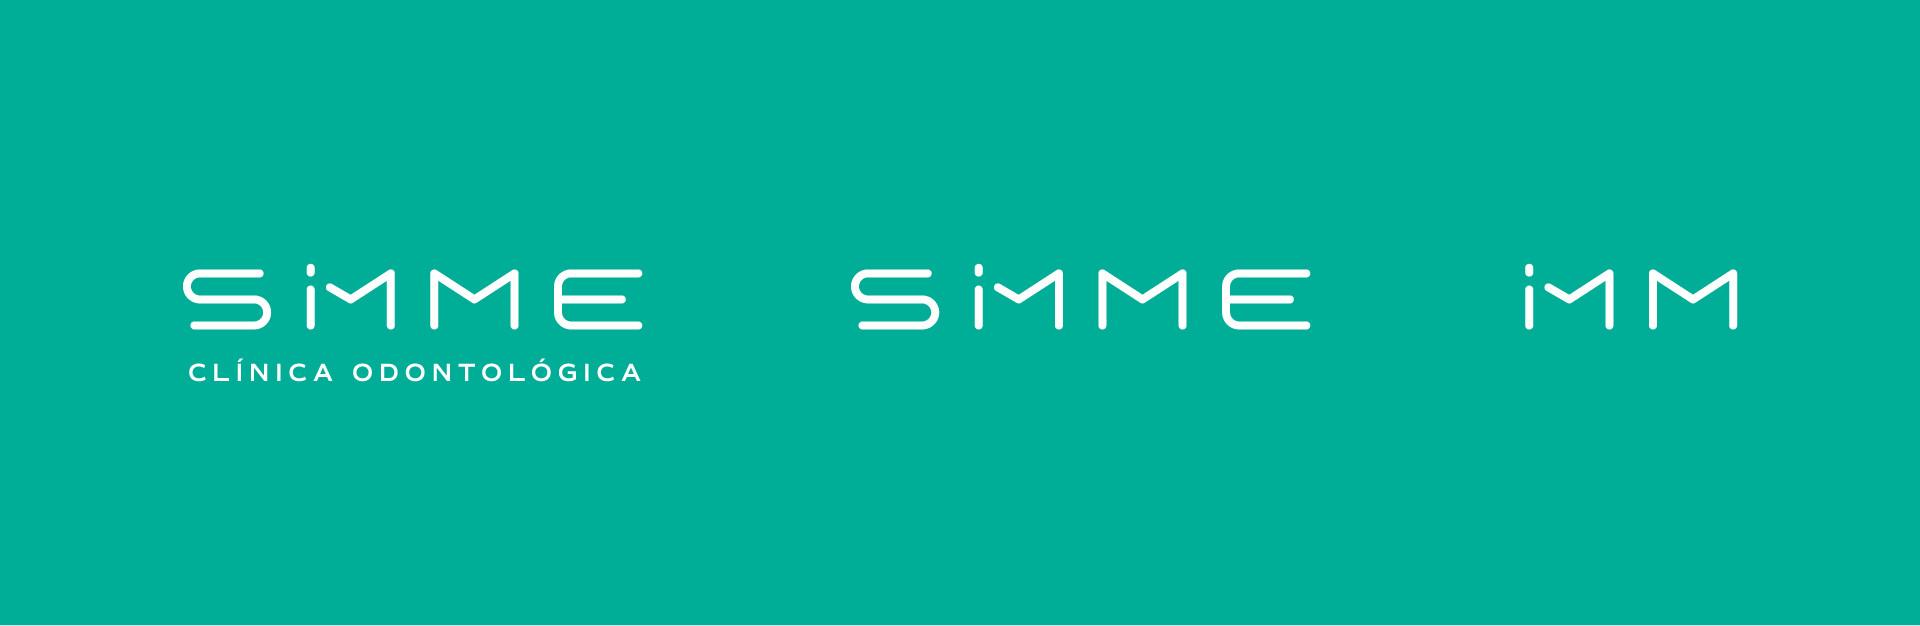 img-portfolio-simme-voadora (5).jpg